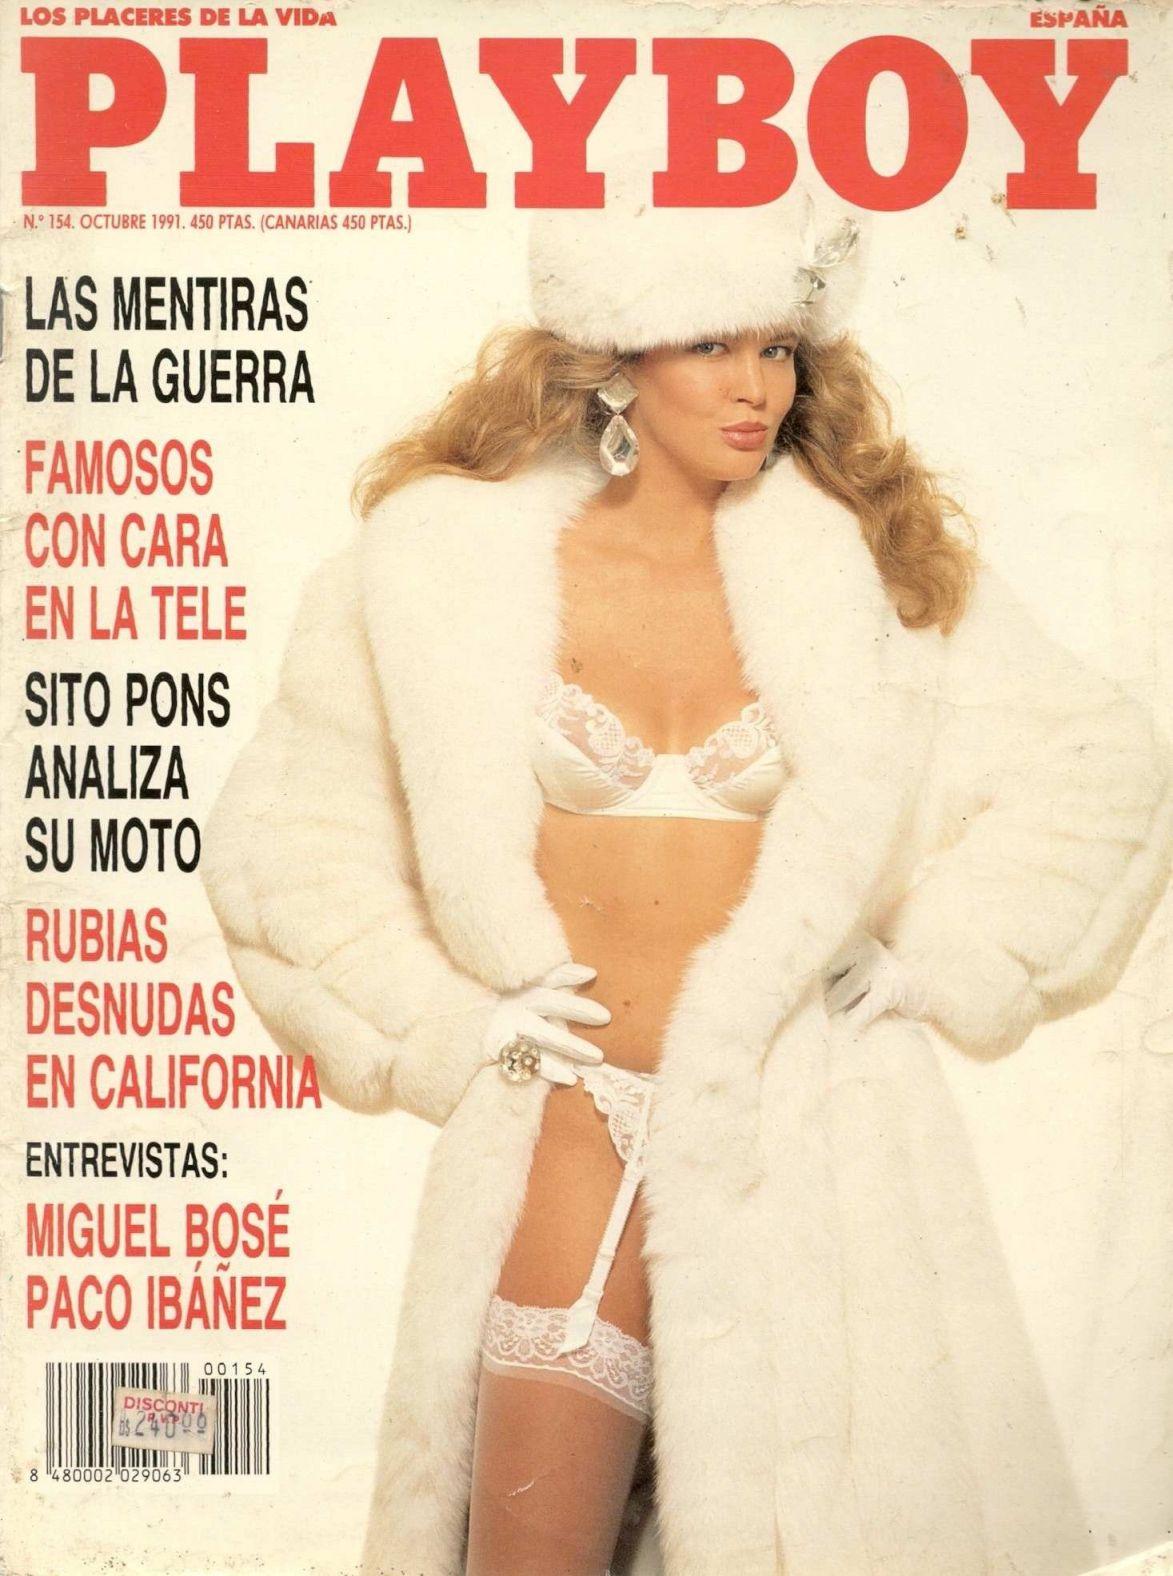 Playboy_10-1991_Spain_Scanof.net_001